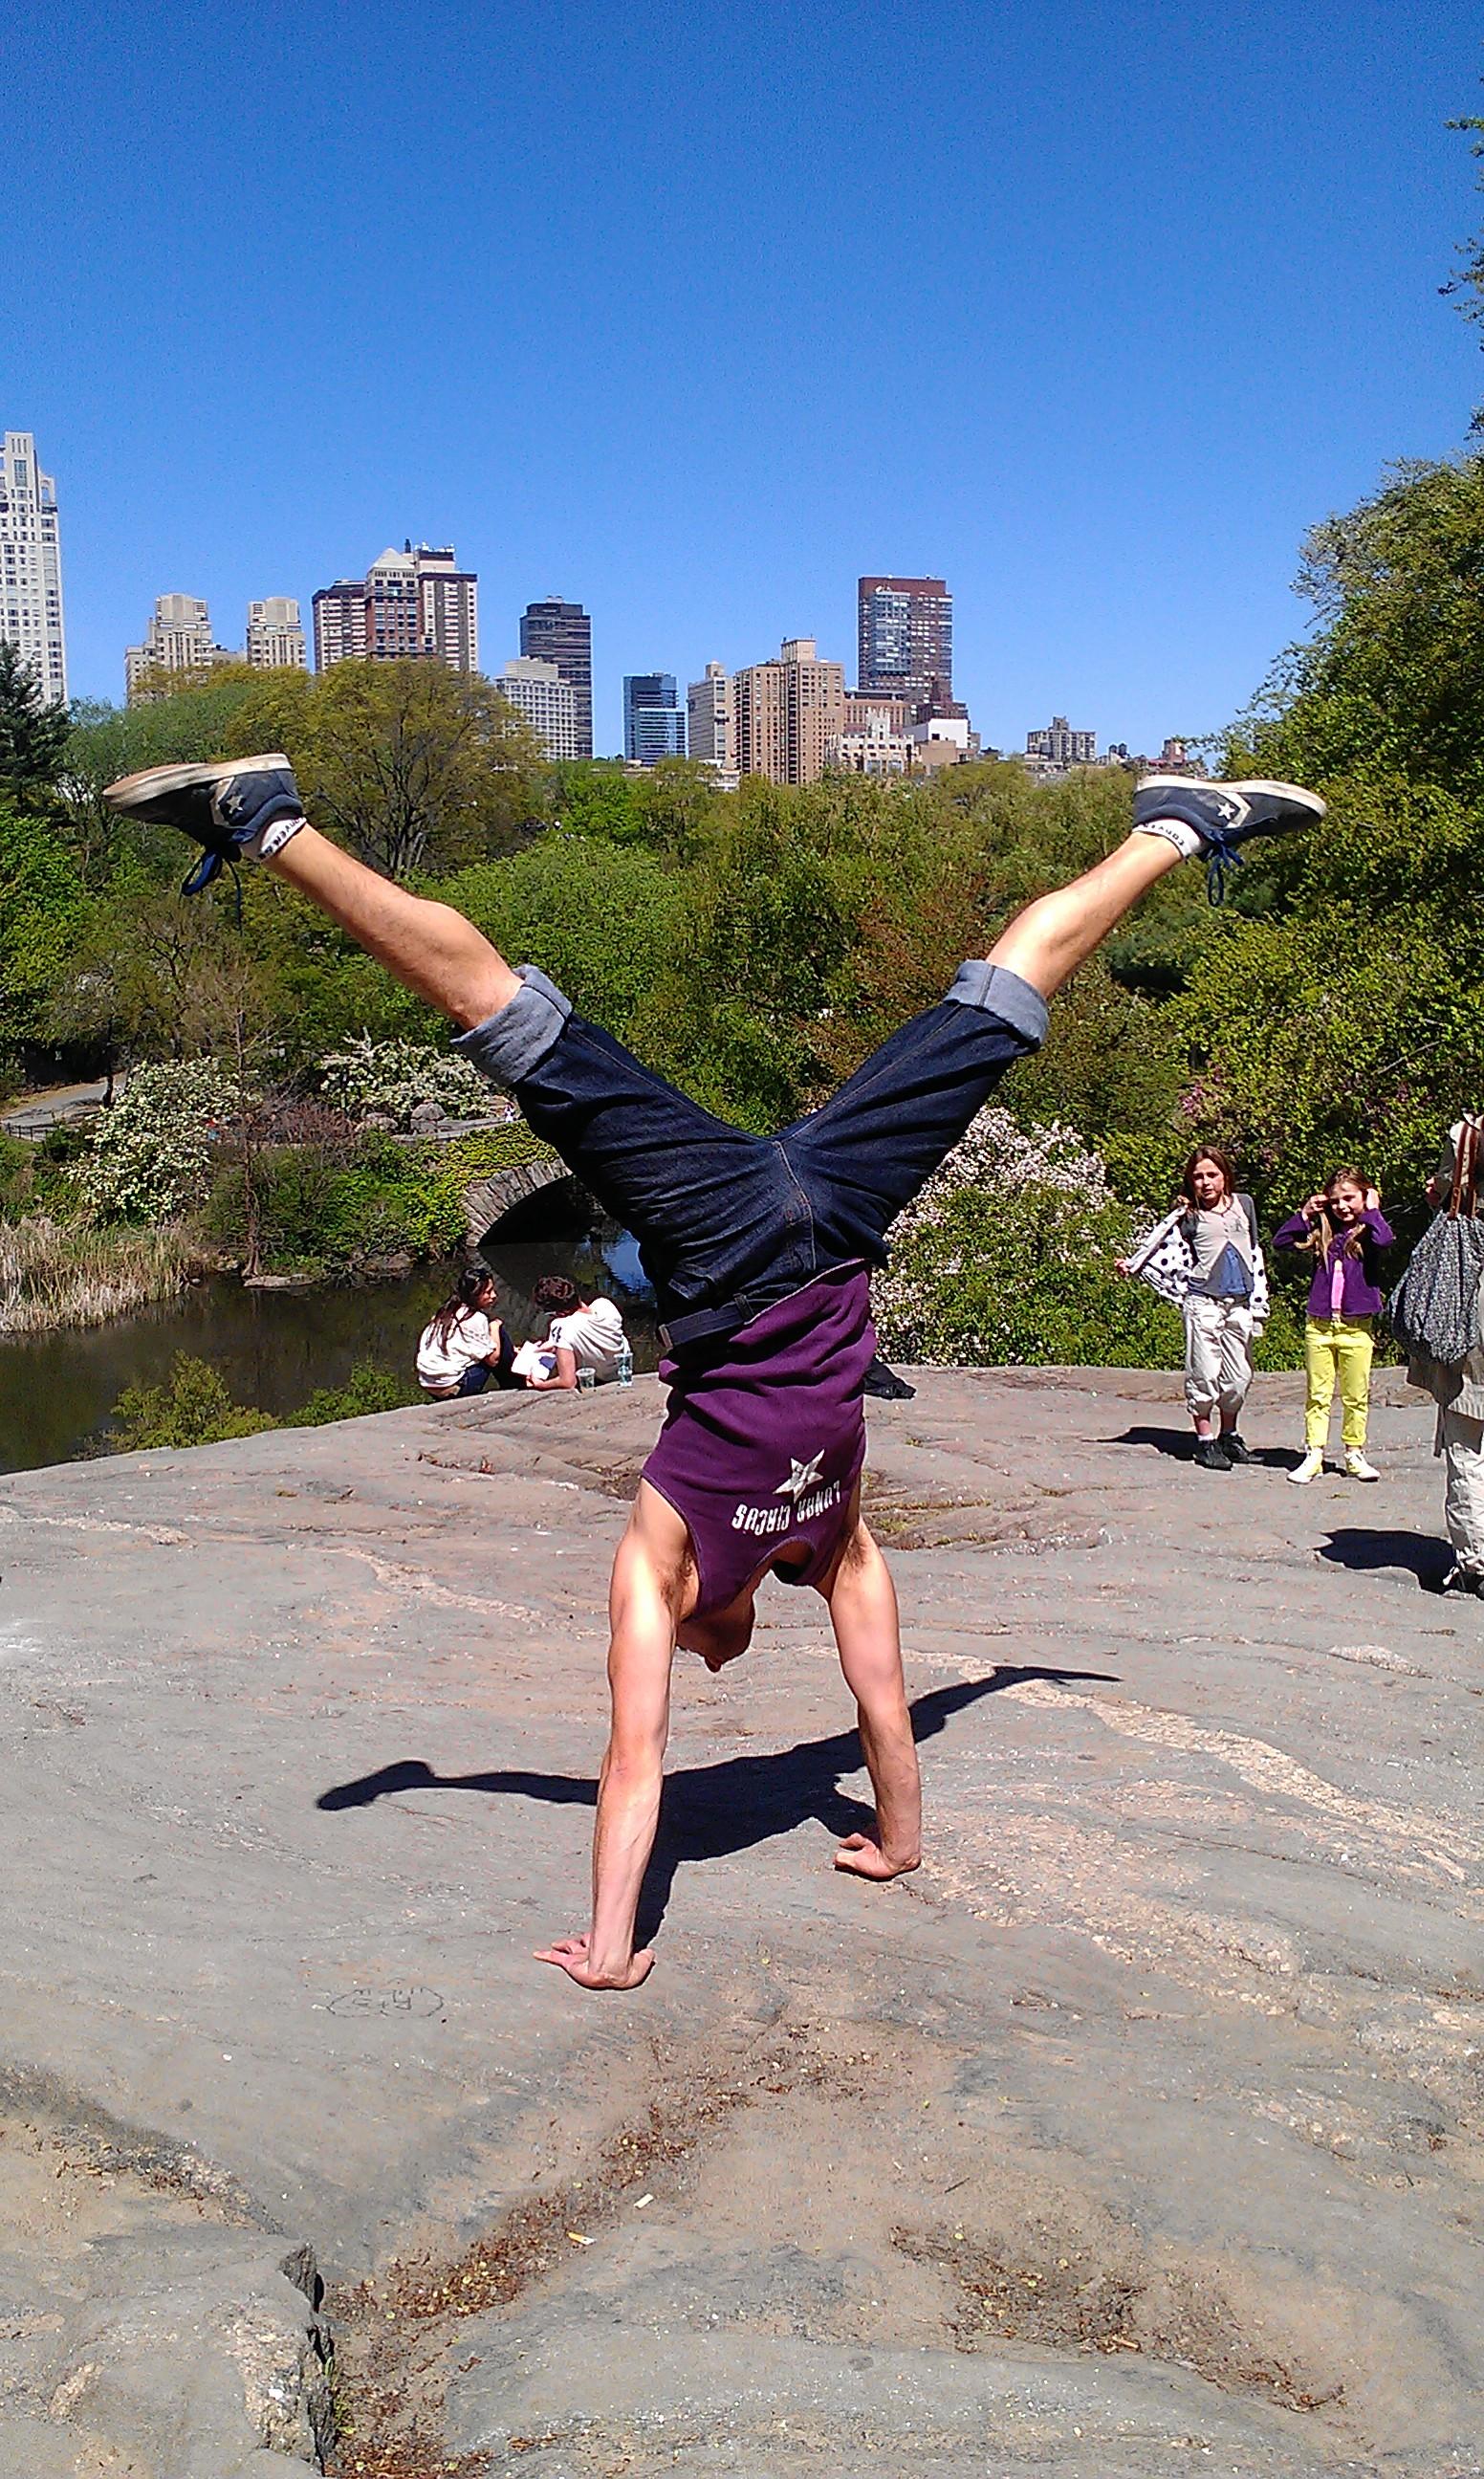 Central Park in the springtime